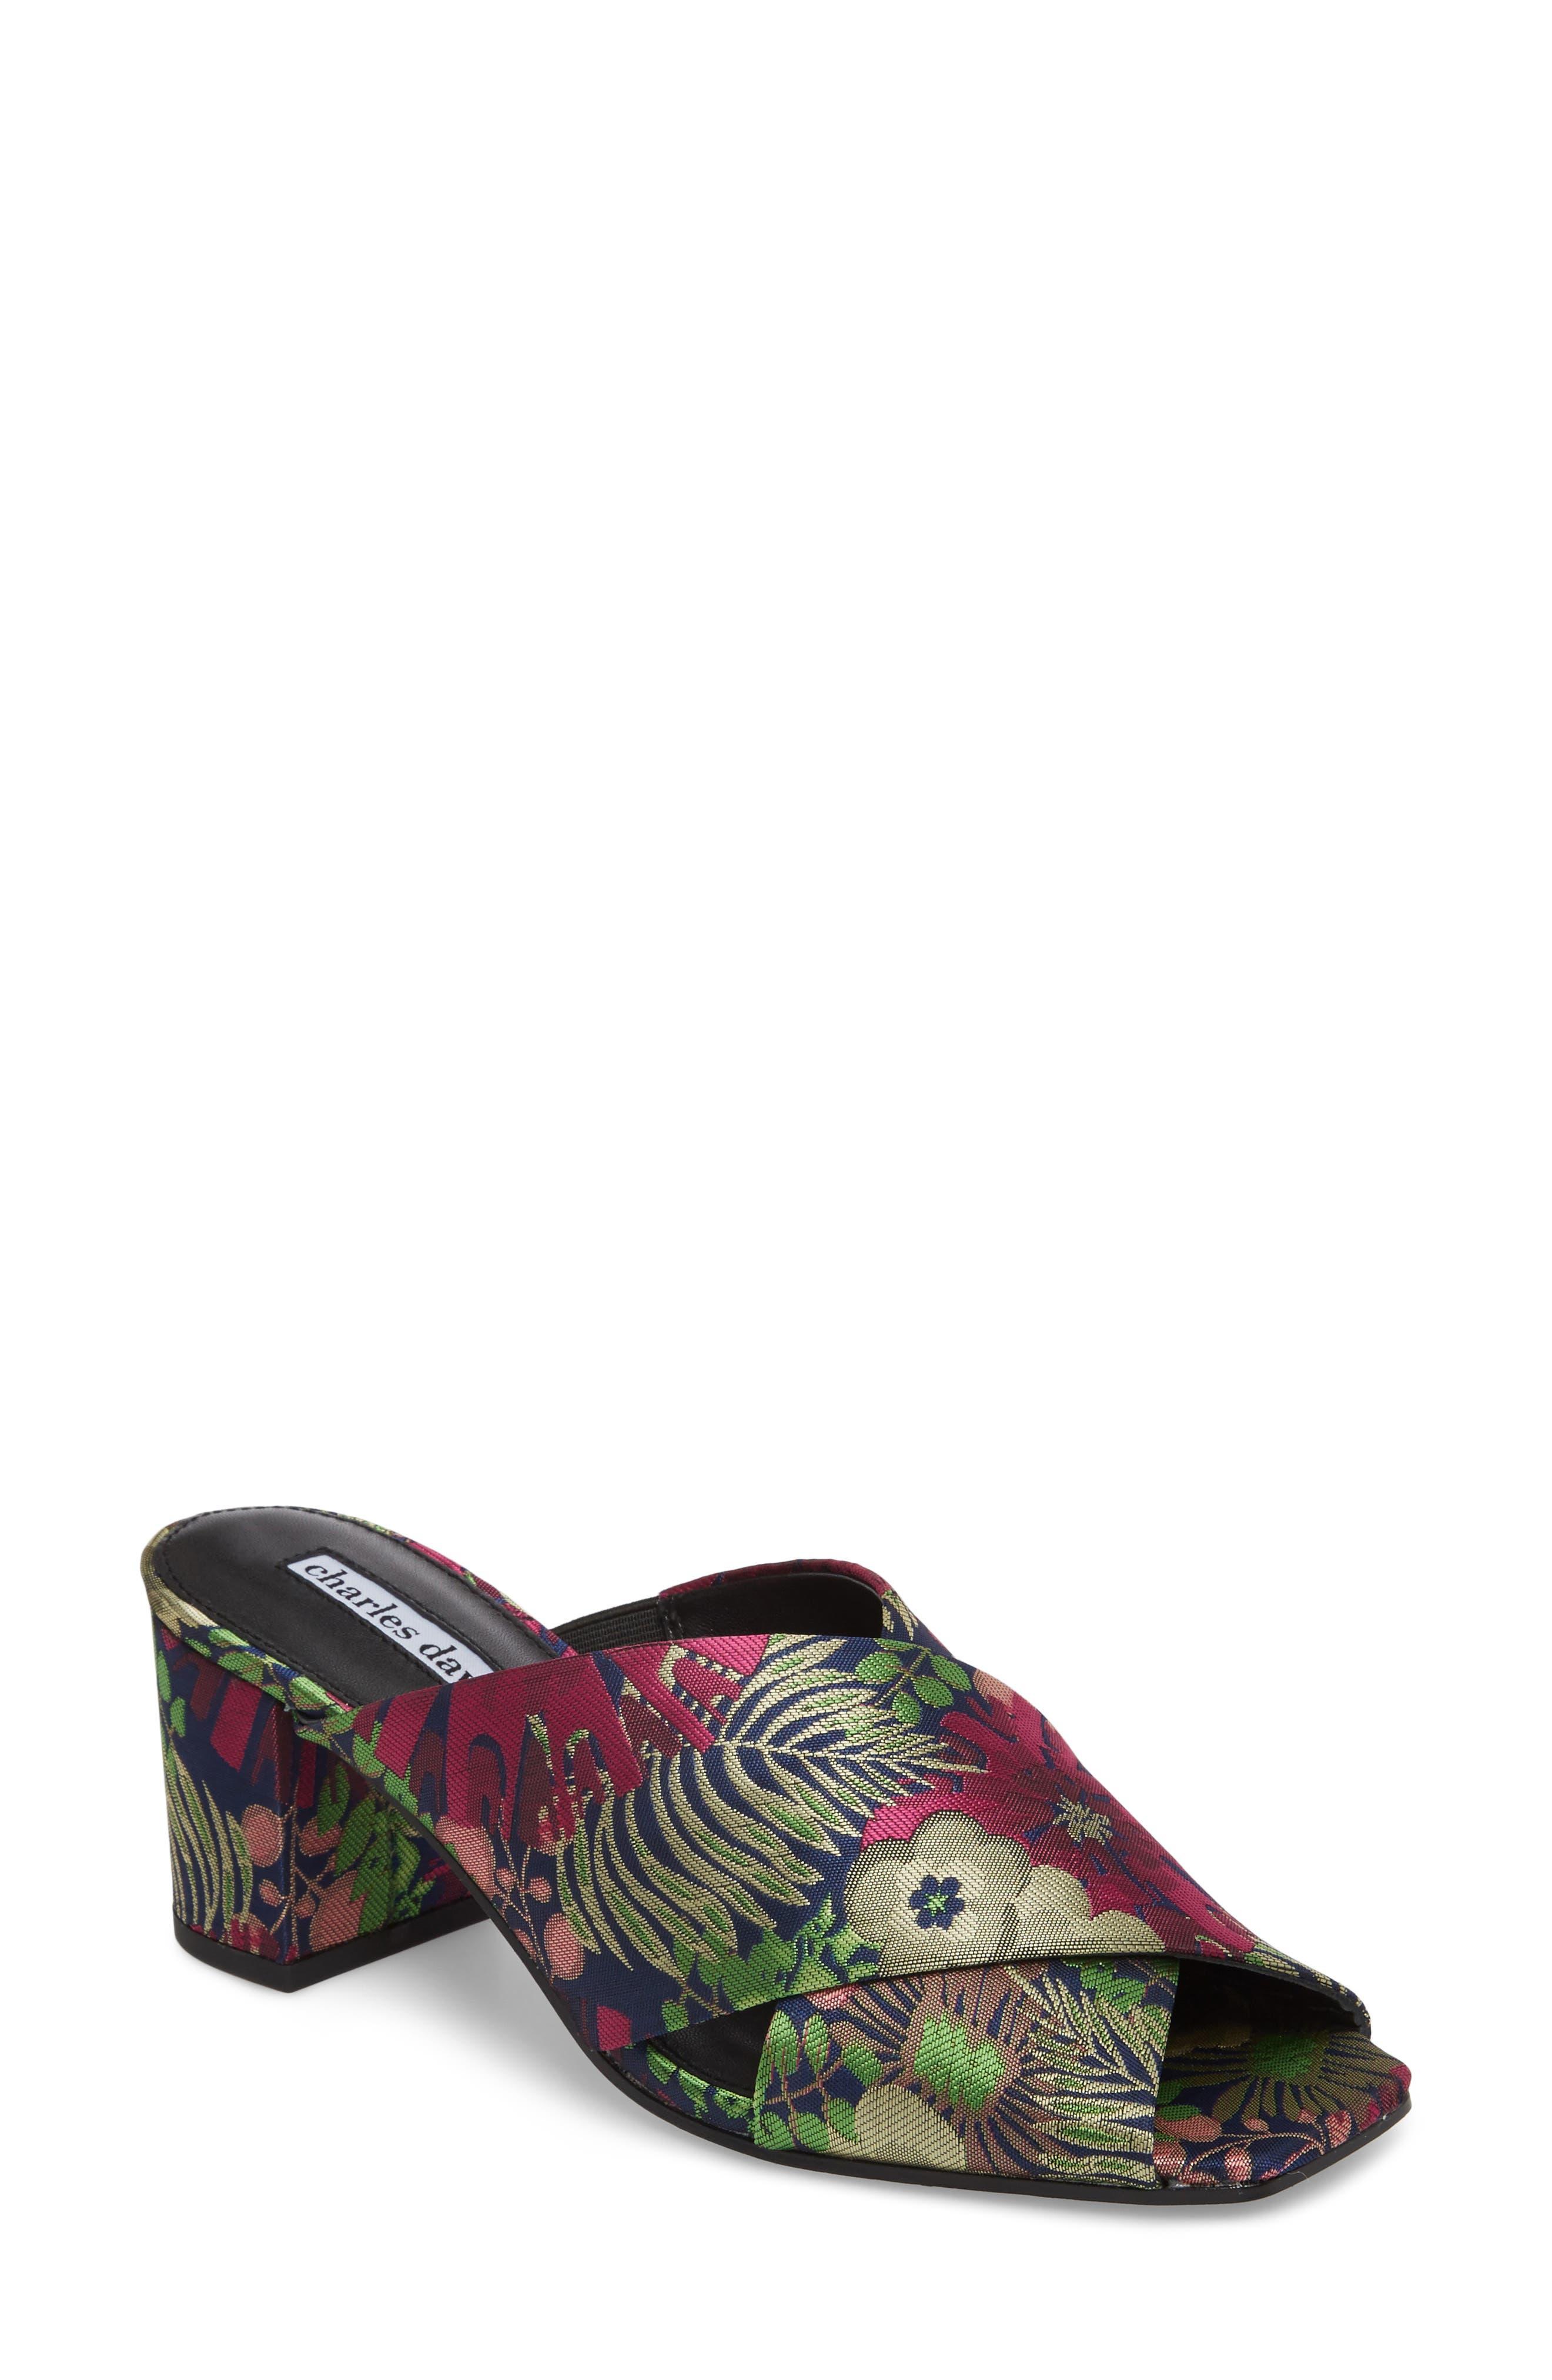 Crissaly Slide Sandal,                             Main thumbnail 1, color,                             GREEN MULTI FLORAL FABRIC